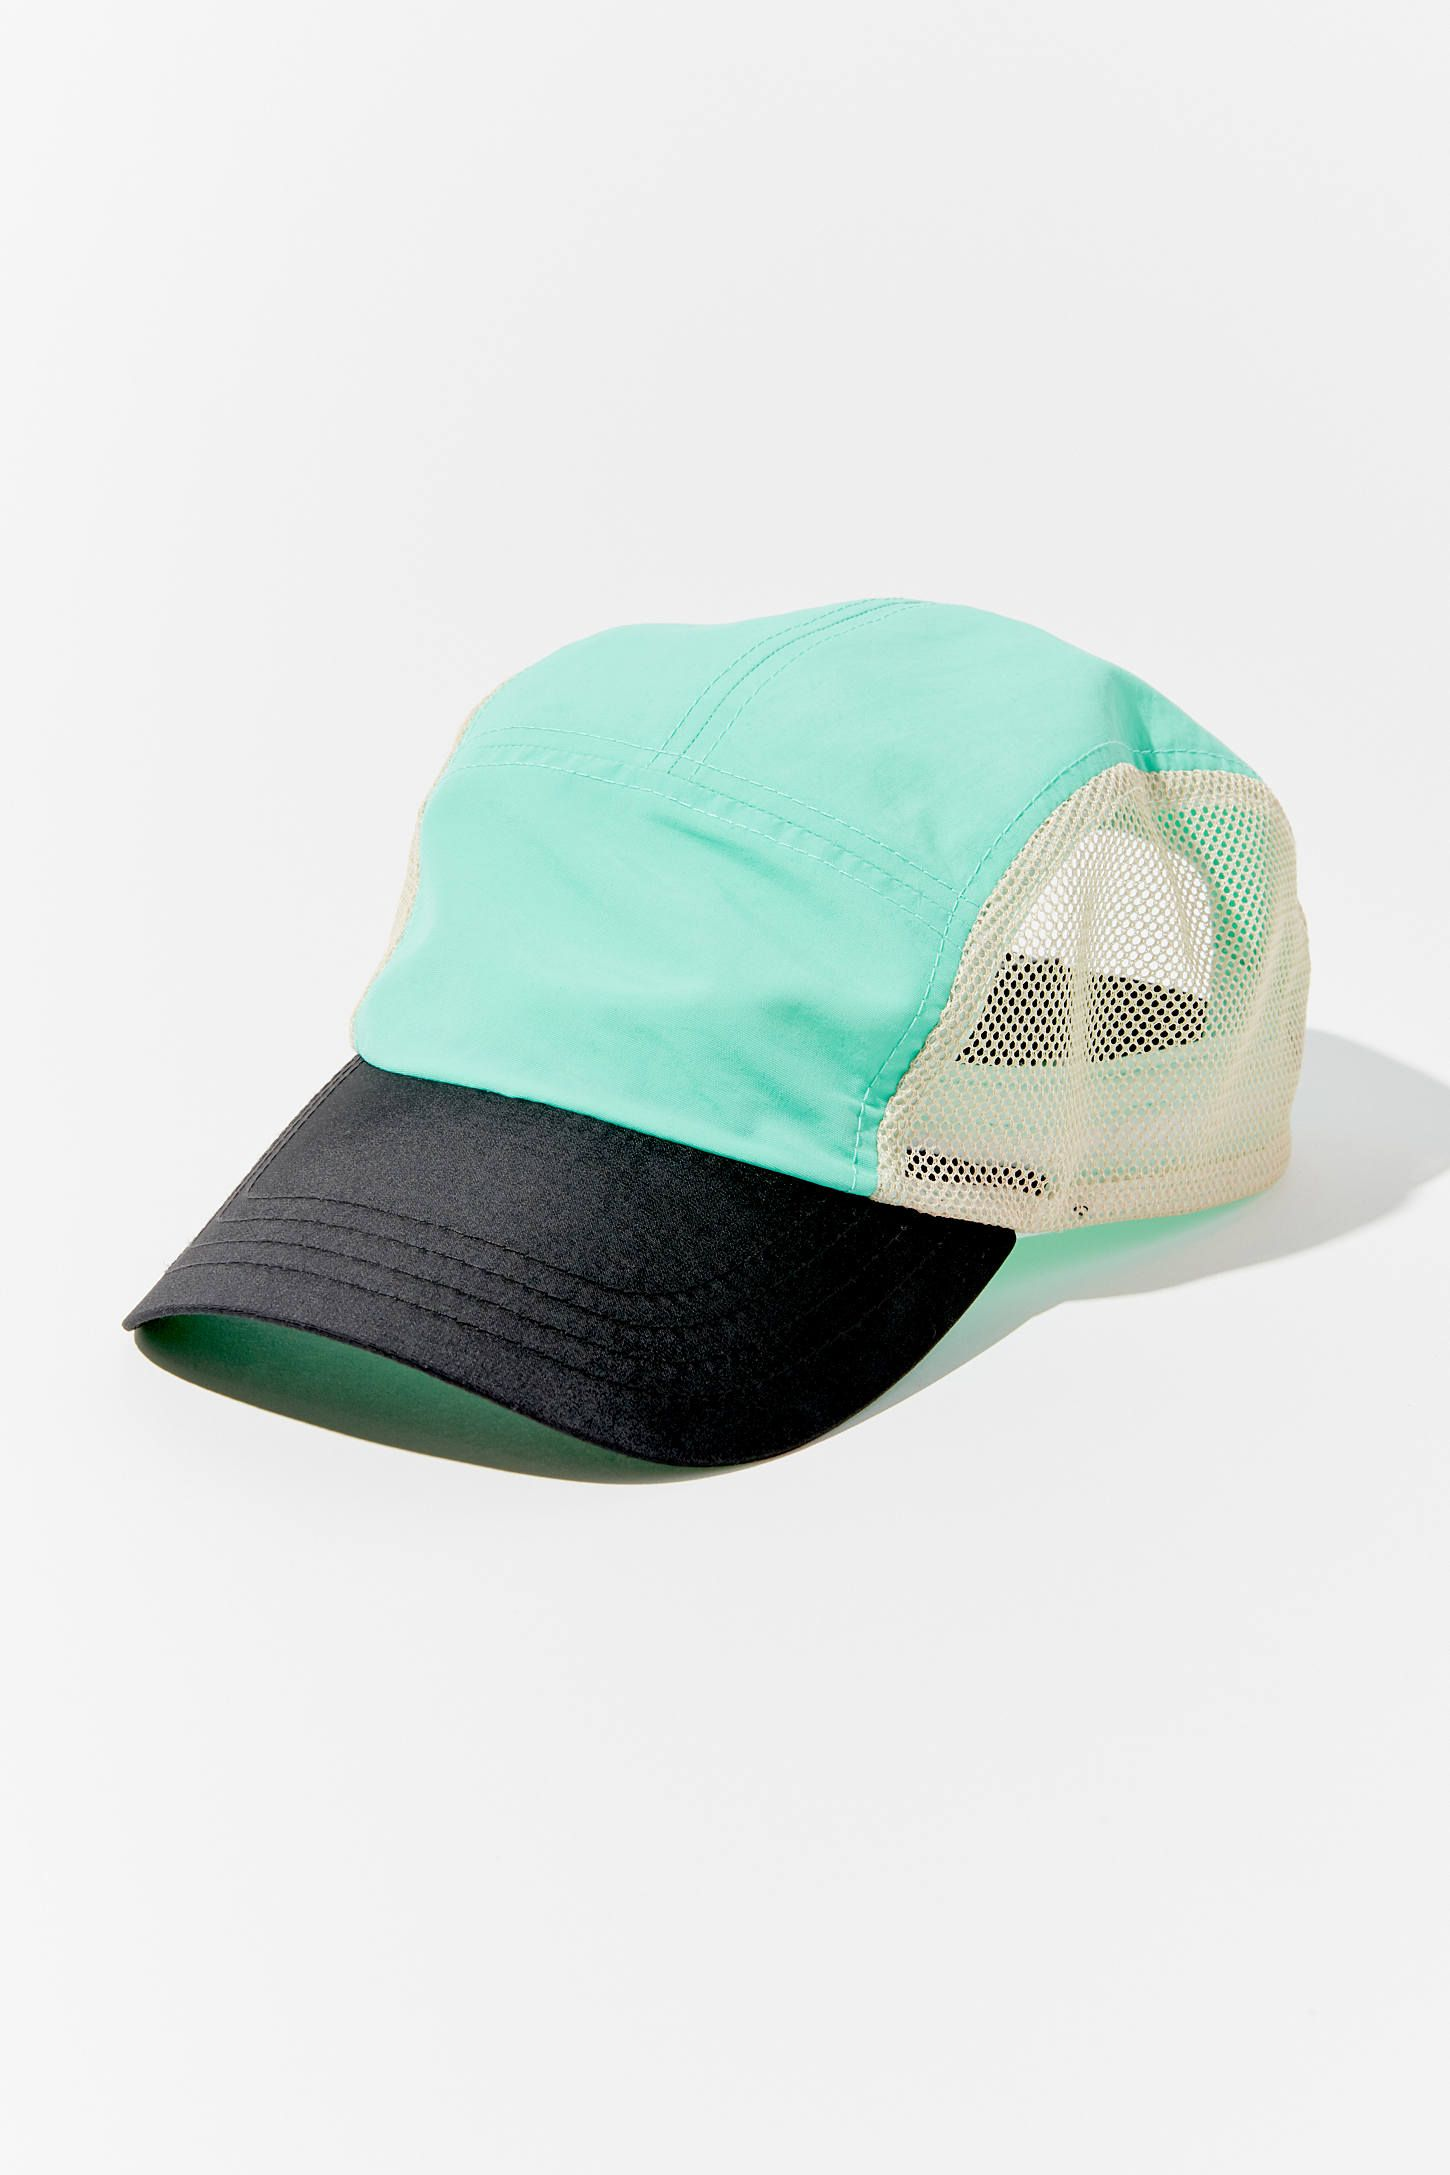 Uo Colorblock 5 Panel Hat Panel Hat 5 Panel Hat Hats